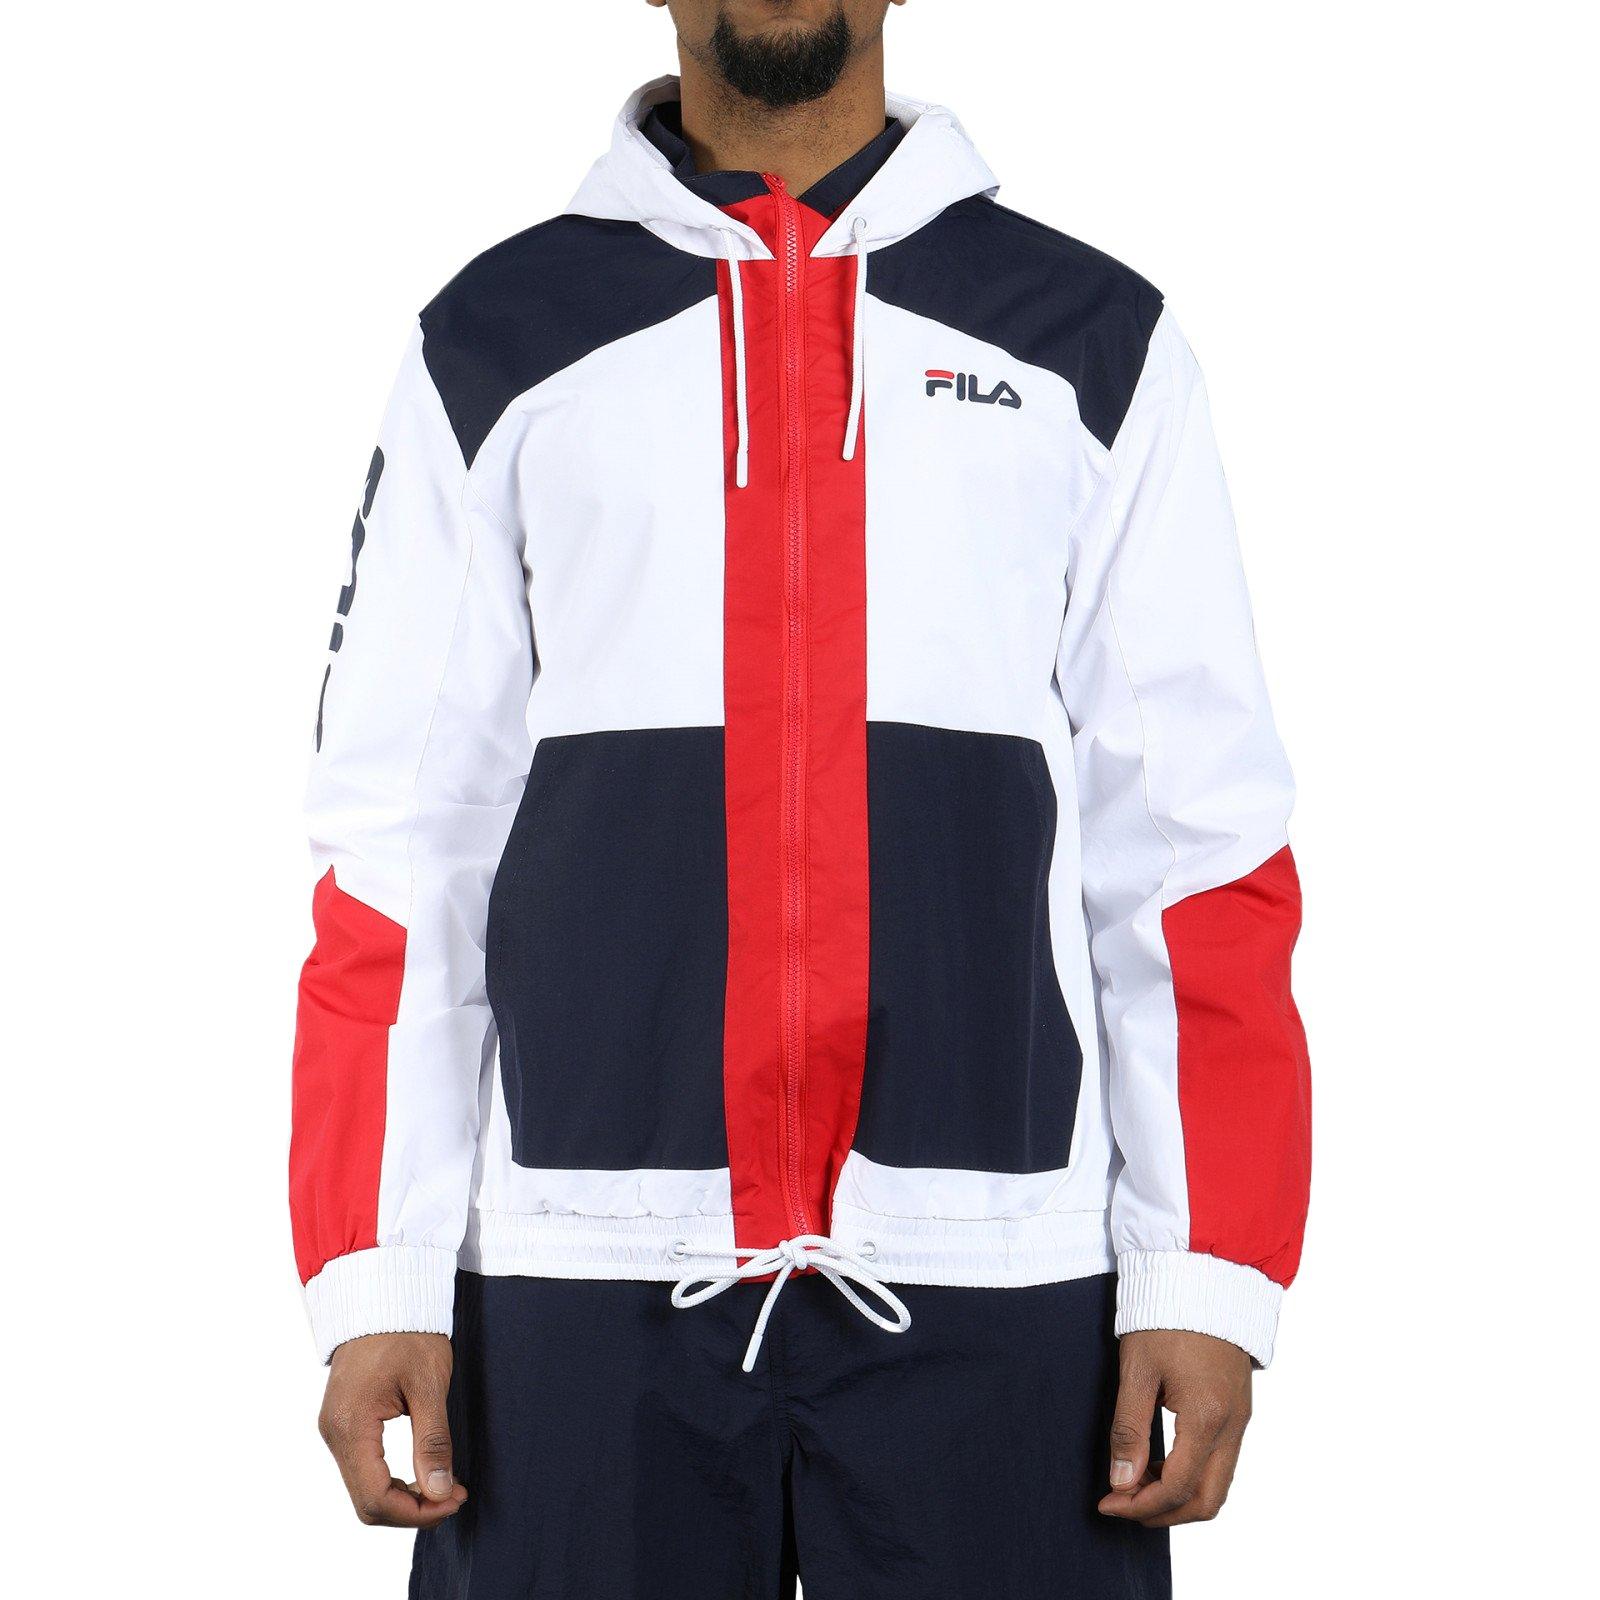 Fila Men's Earl Full Zip Hooded Jacket, White, Peacoat, Chinese Red, 2XL